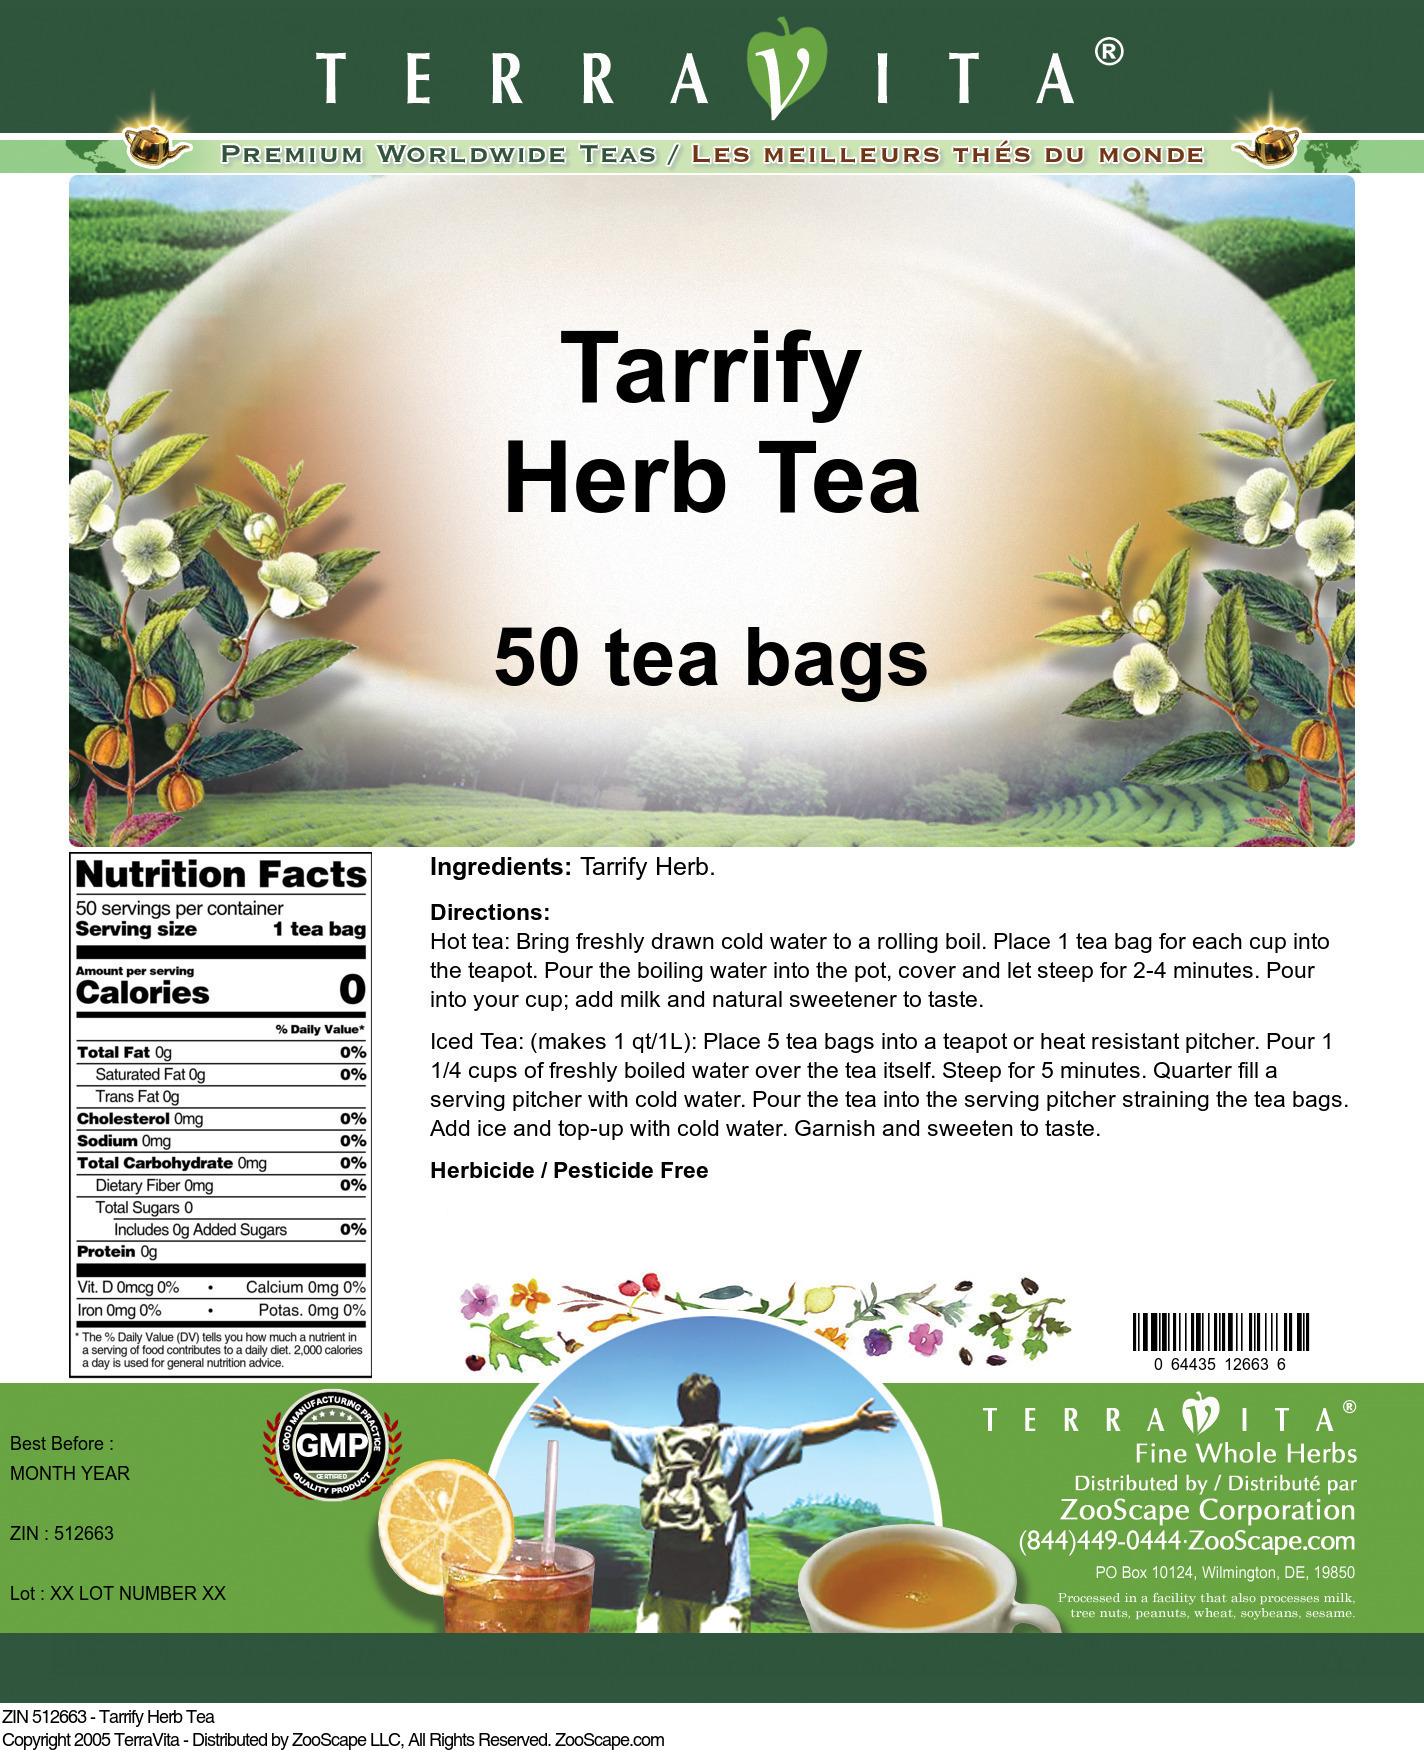 Tarrify Herb Tea